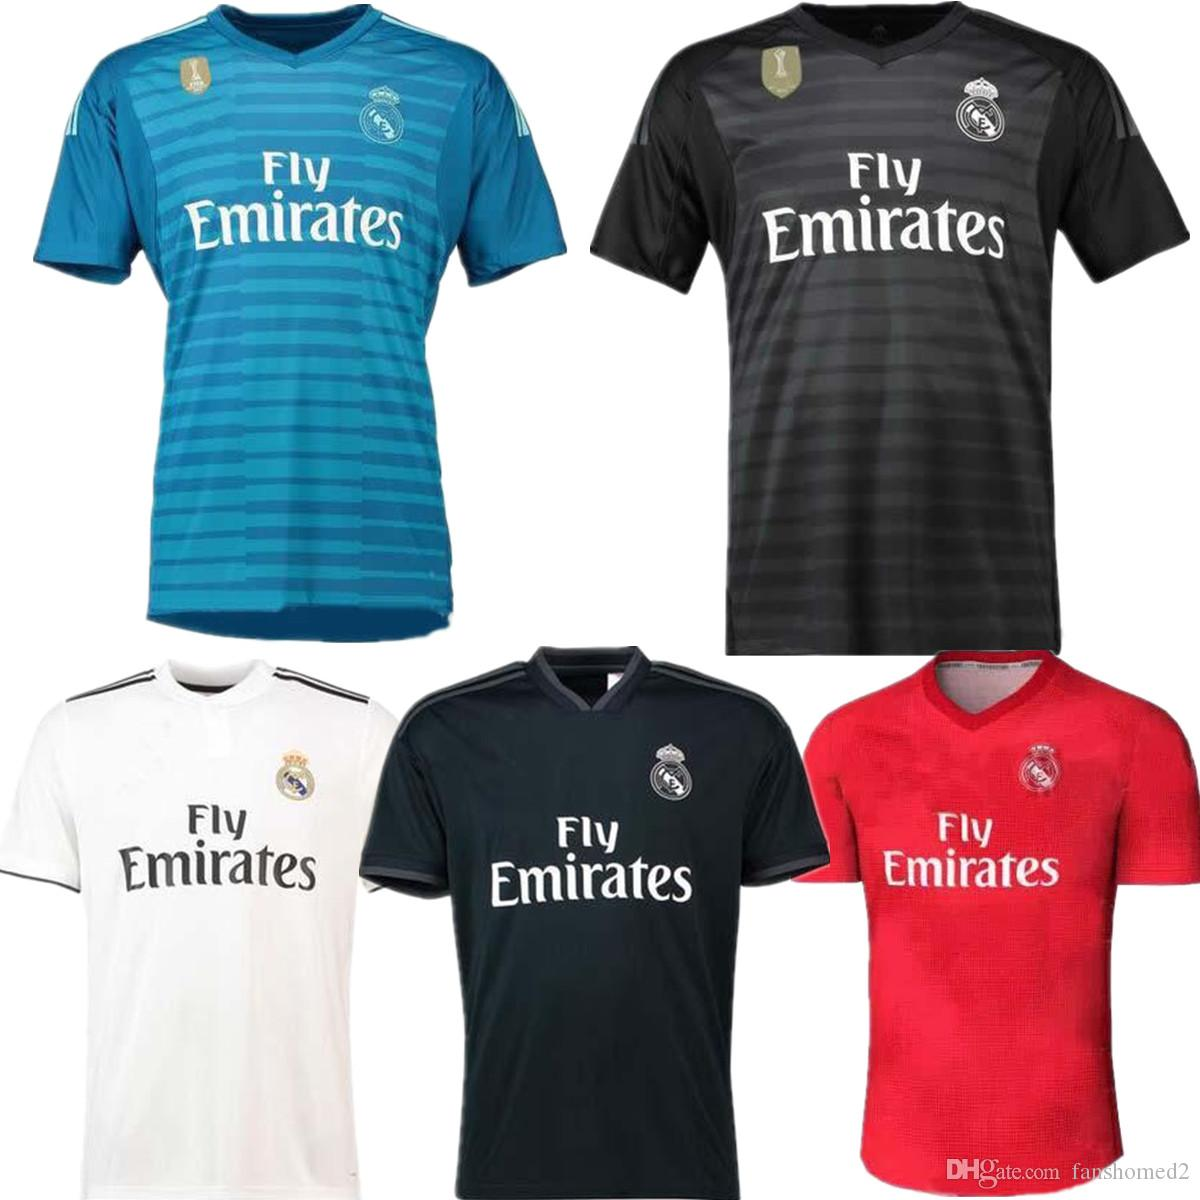 2018 2019 Real Madrid   1 25 Courtois Portero Camiseta De Visitante Tercer  Rojo Varane Bale Camisetas De Fútbol De Isco Navas Arsensio Modric BENZEMA  ... 866255bf1e6bf